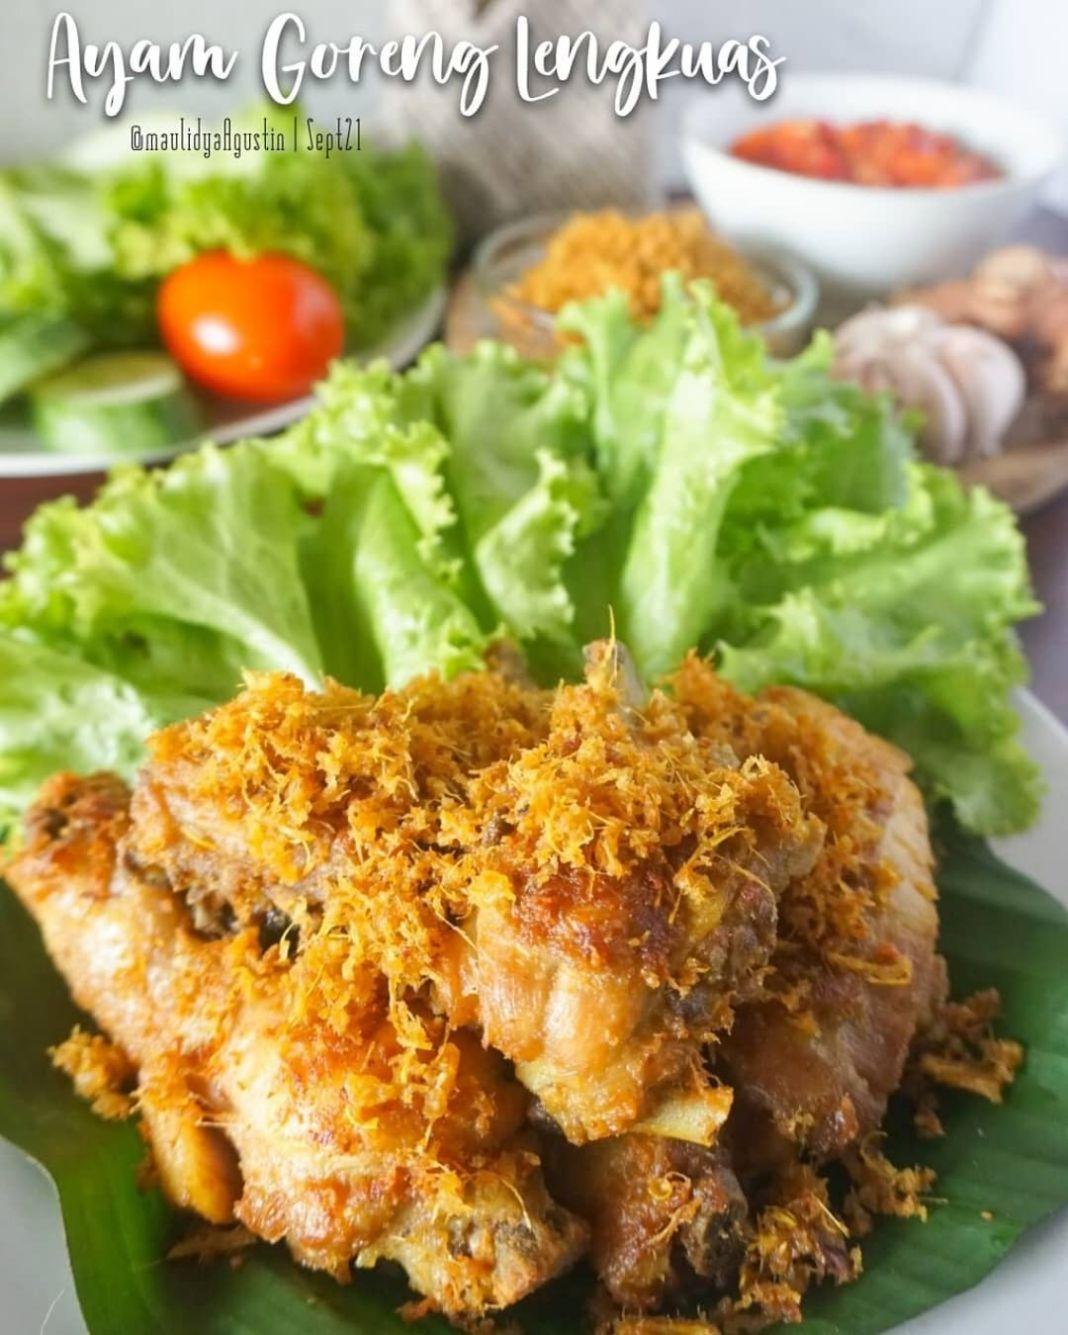 Info kuliner, nyetok ayam goreng yuuk!! yg kali ini dijamin cepet abis HAHAHA  AYAM GORENG LENGKUAS  Bahan : …